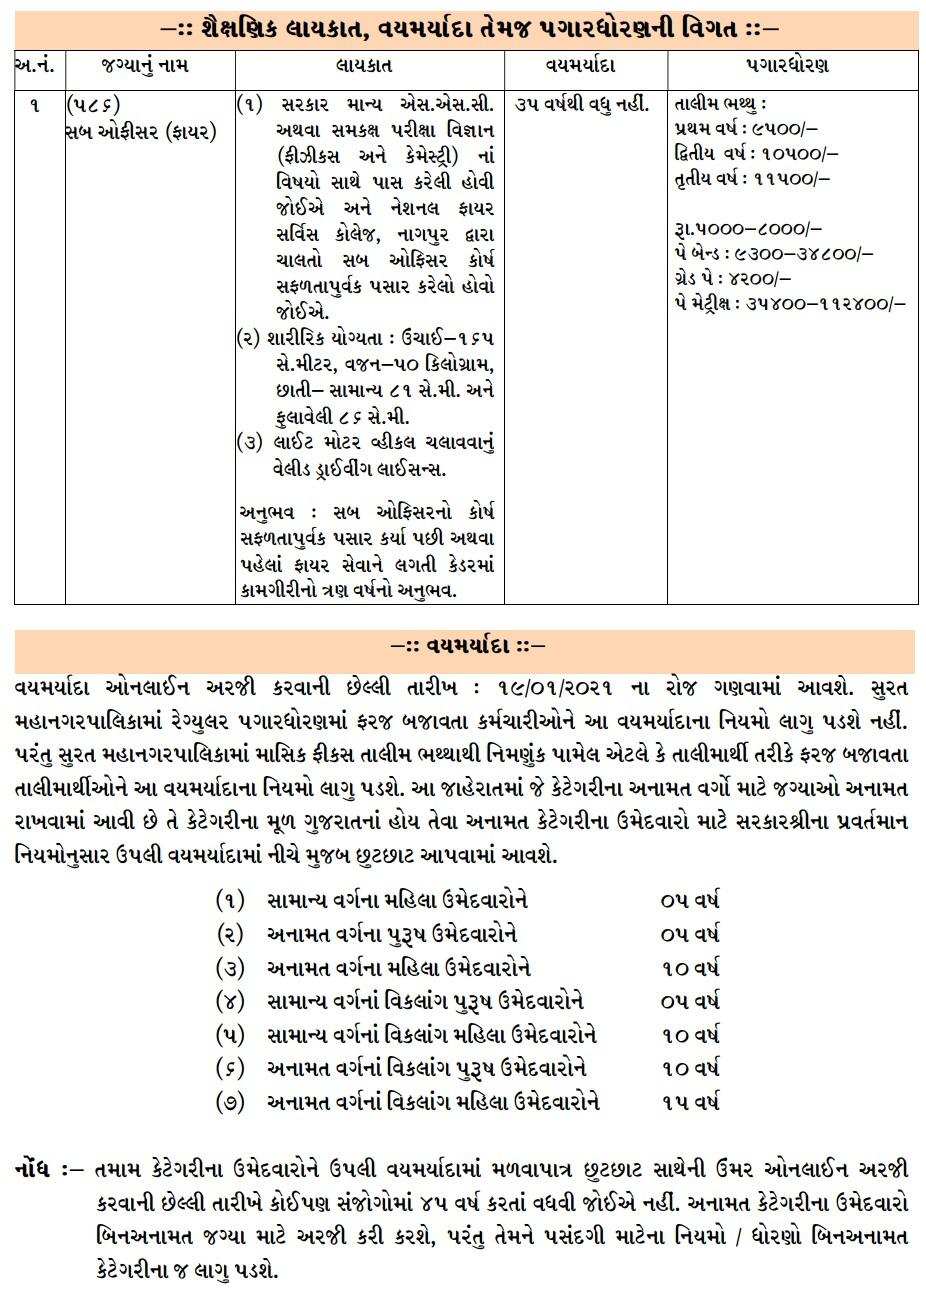 Surat Municipal Corporation Recruitment 2021/ Sub Officer (Fire)